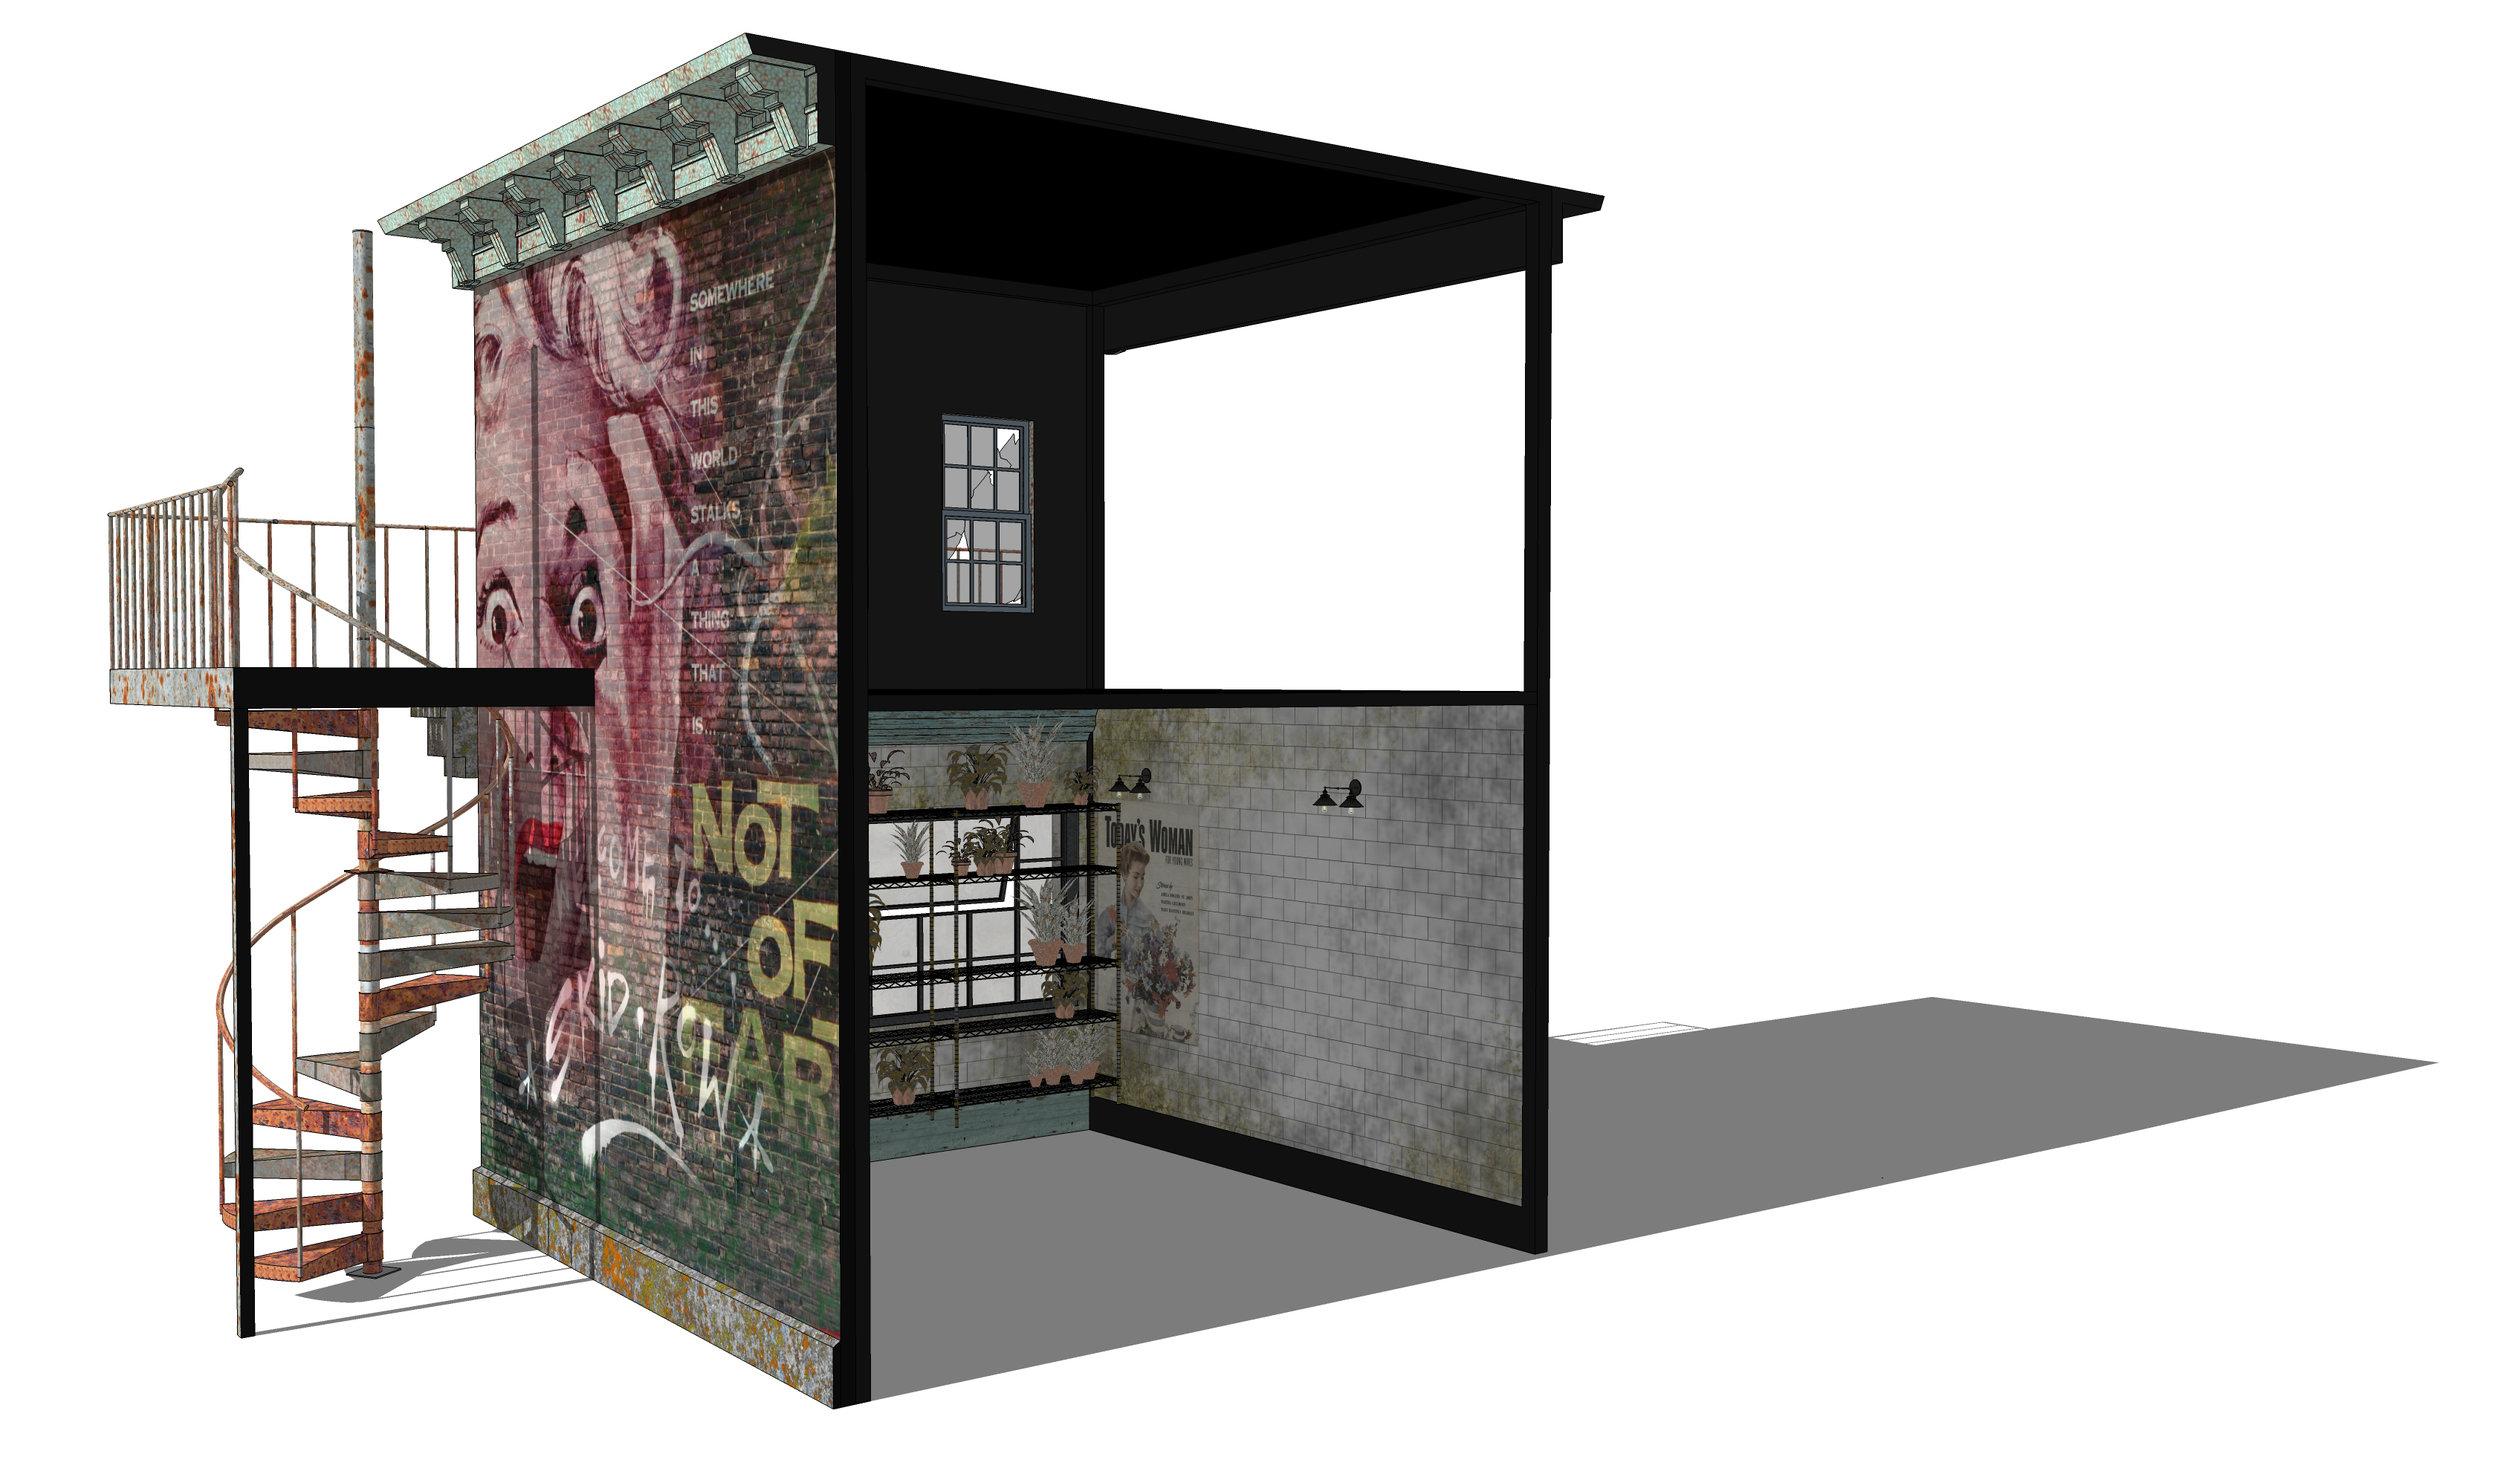 LSOH FINAL Mushnik Store Design - SHOP CLOSED WITHOUT INTERIOR TRUCK 3.jpg